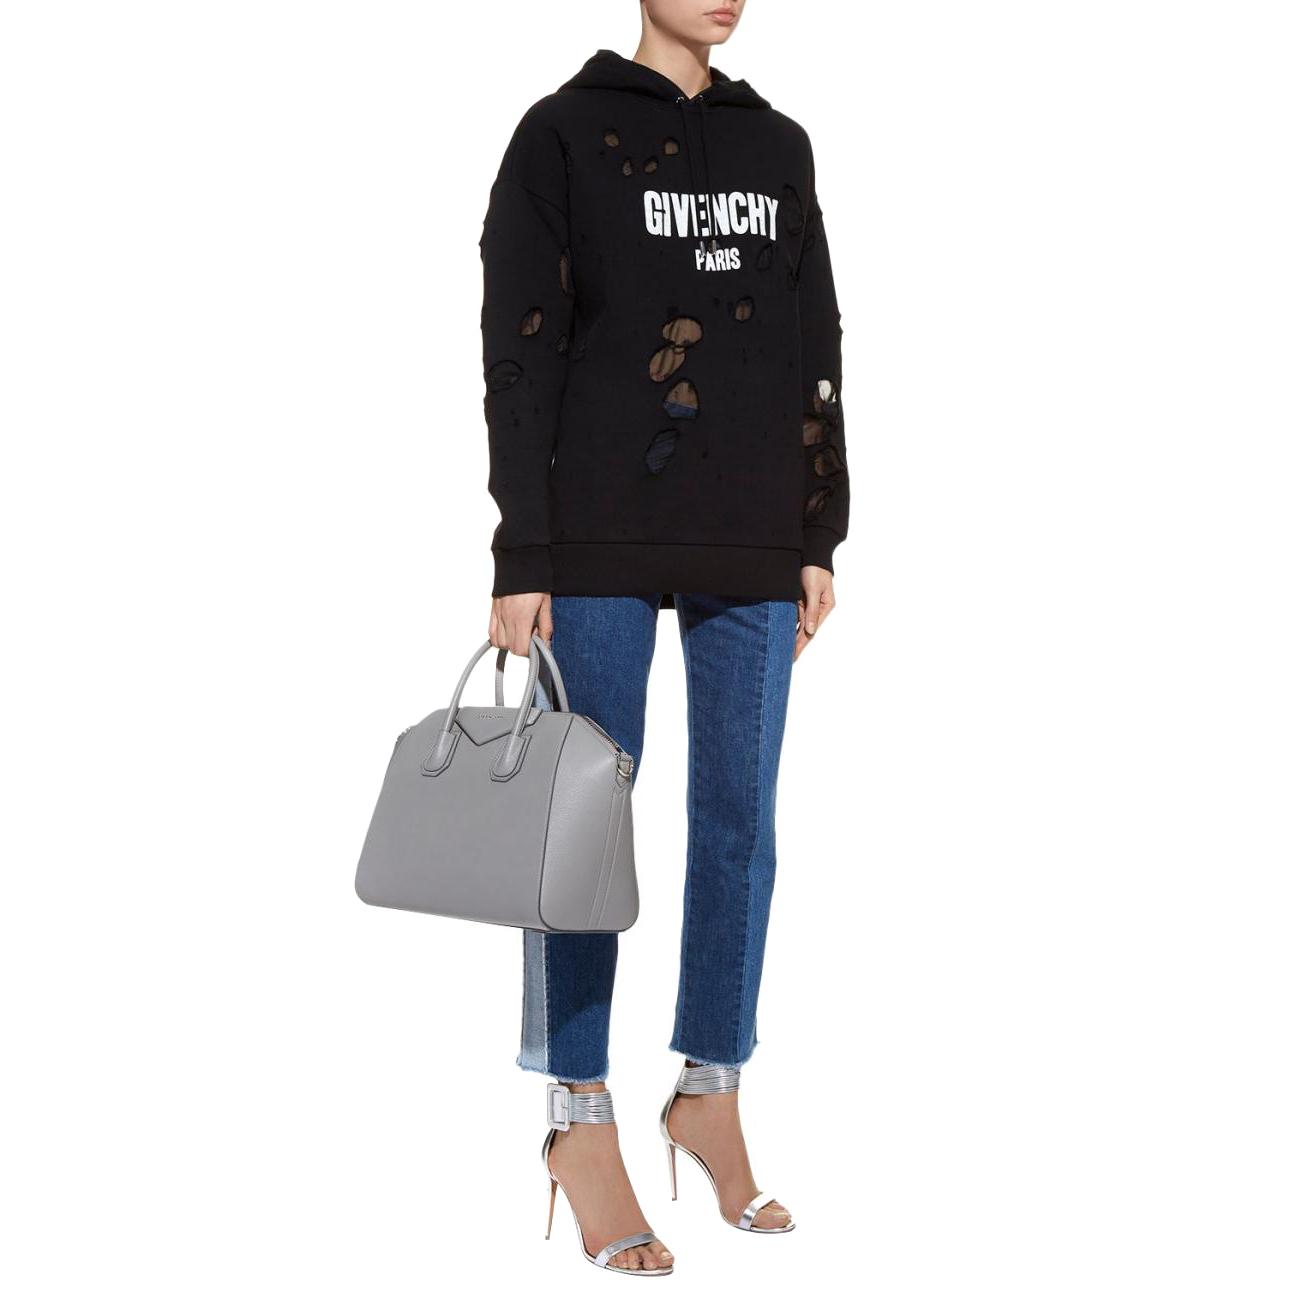 b594f43bf904db Givenchy Paris Destroyed Hooded Sweatshirt   HEWI London